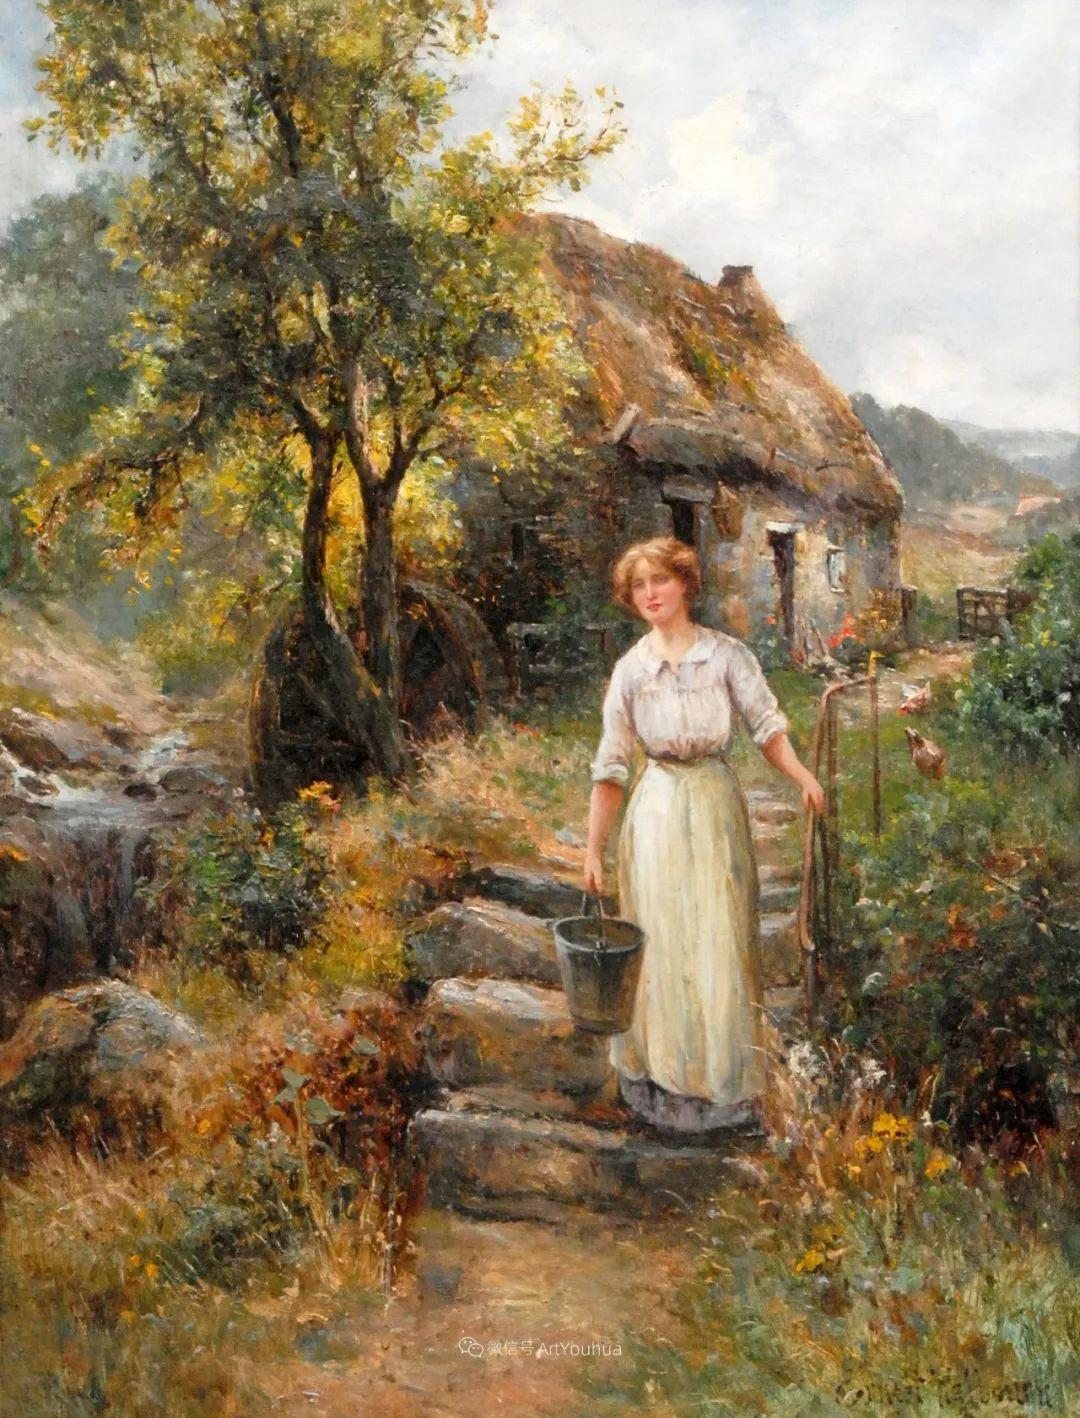 美丽村姑与诗意田园,英国画家Ernest Charles Walbourn作品(下)插图9